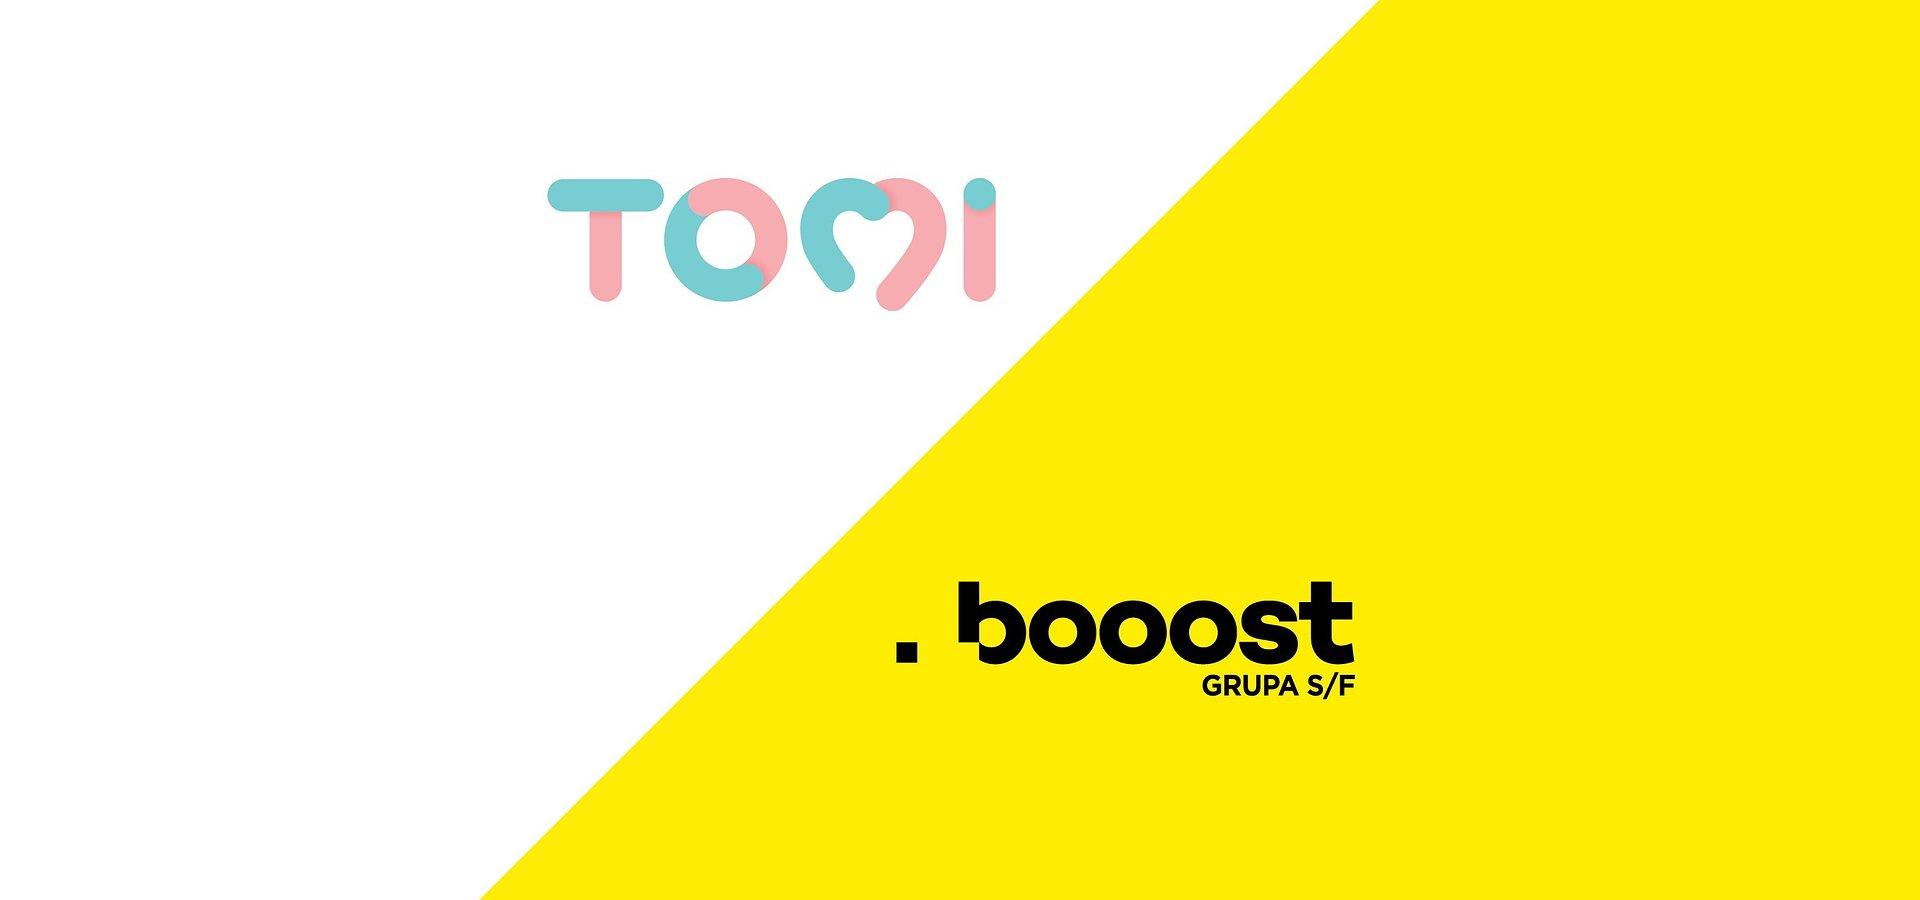 Booost (Grupa S/F) dla Tomi.pl